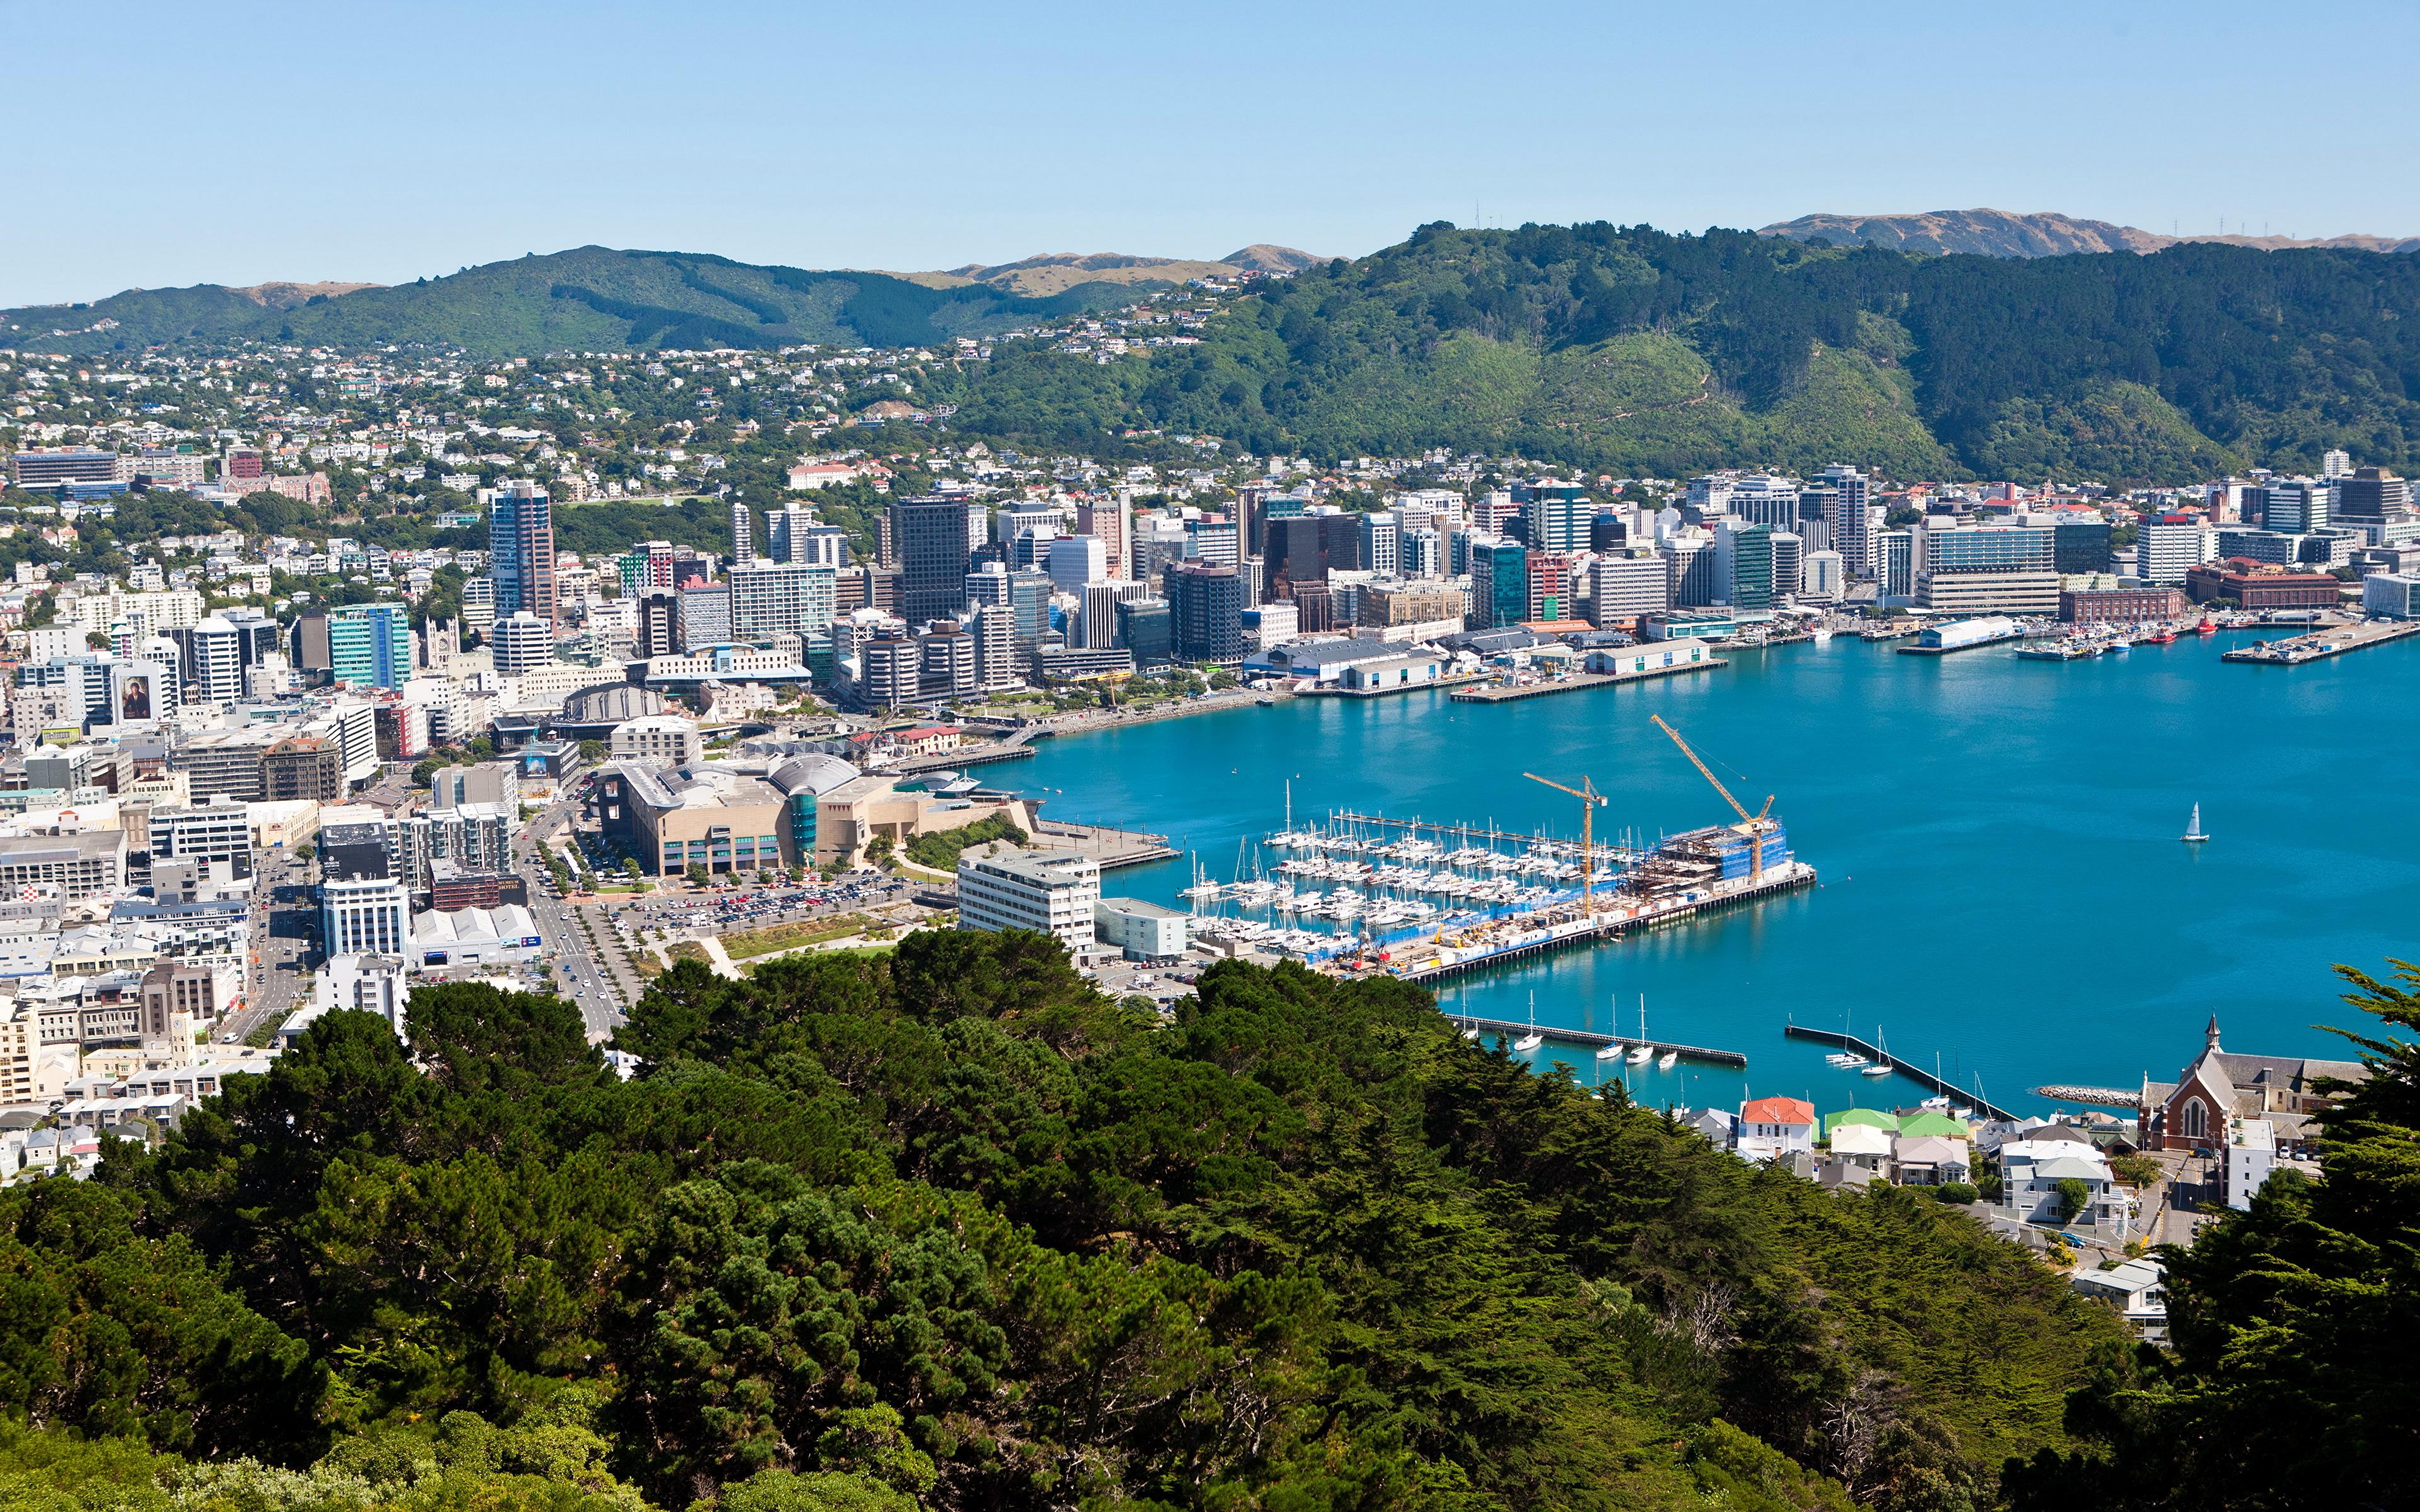 Images New Zealand Wellington Coast Marinas From above 3840x2400 3840x2400